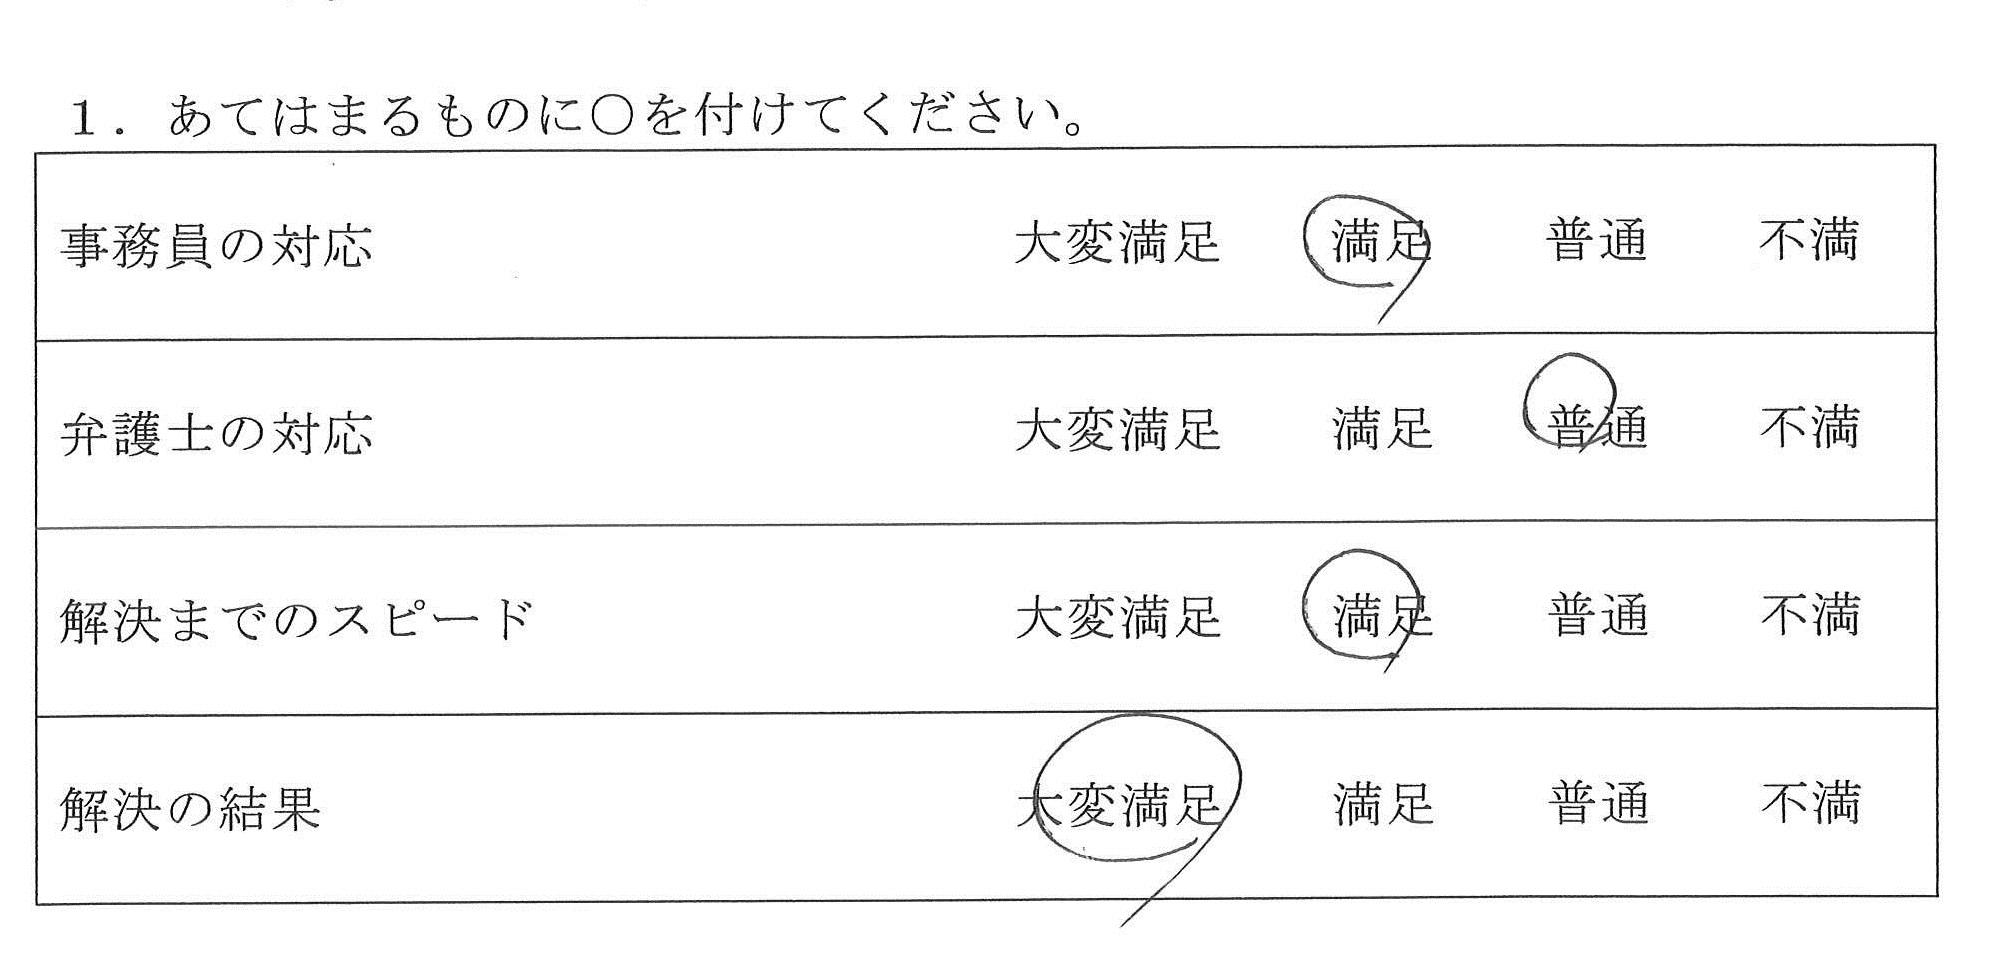 愛知県岡崎市40代男性(債務整理)の依頼者様の声 :